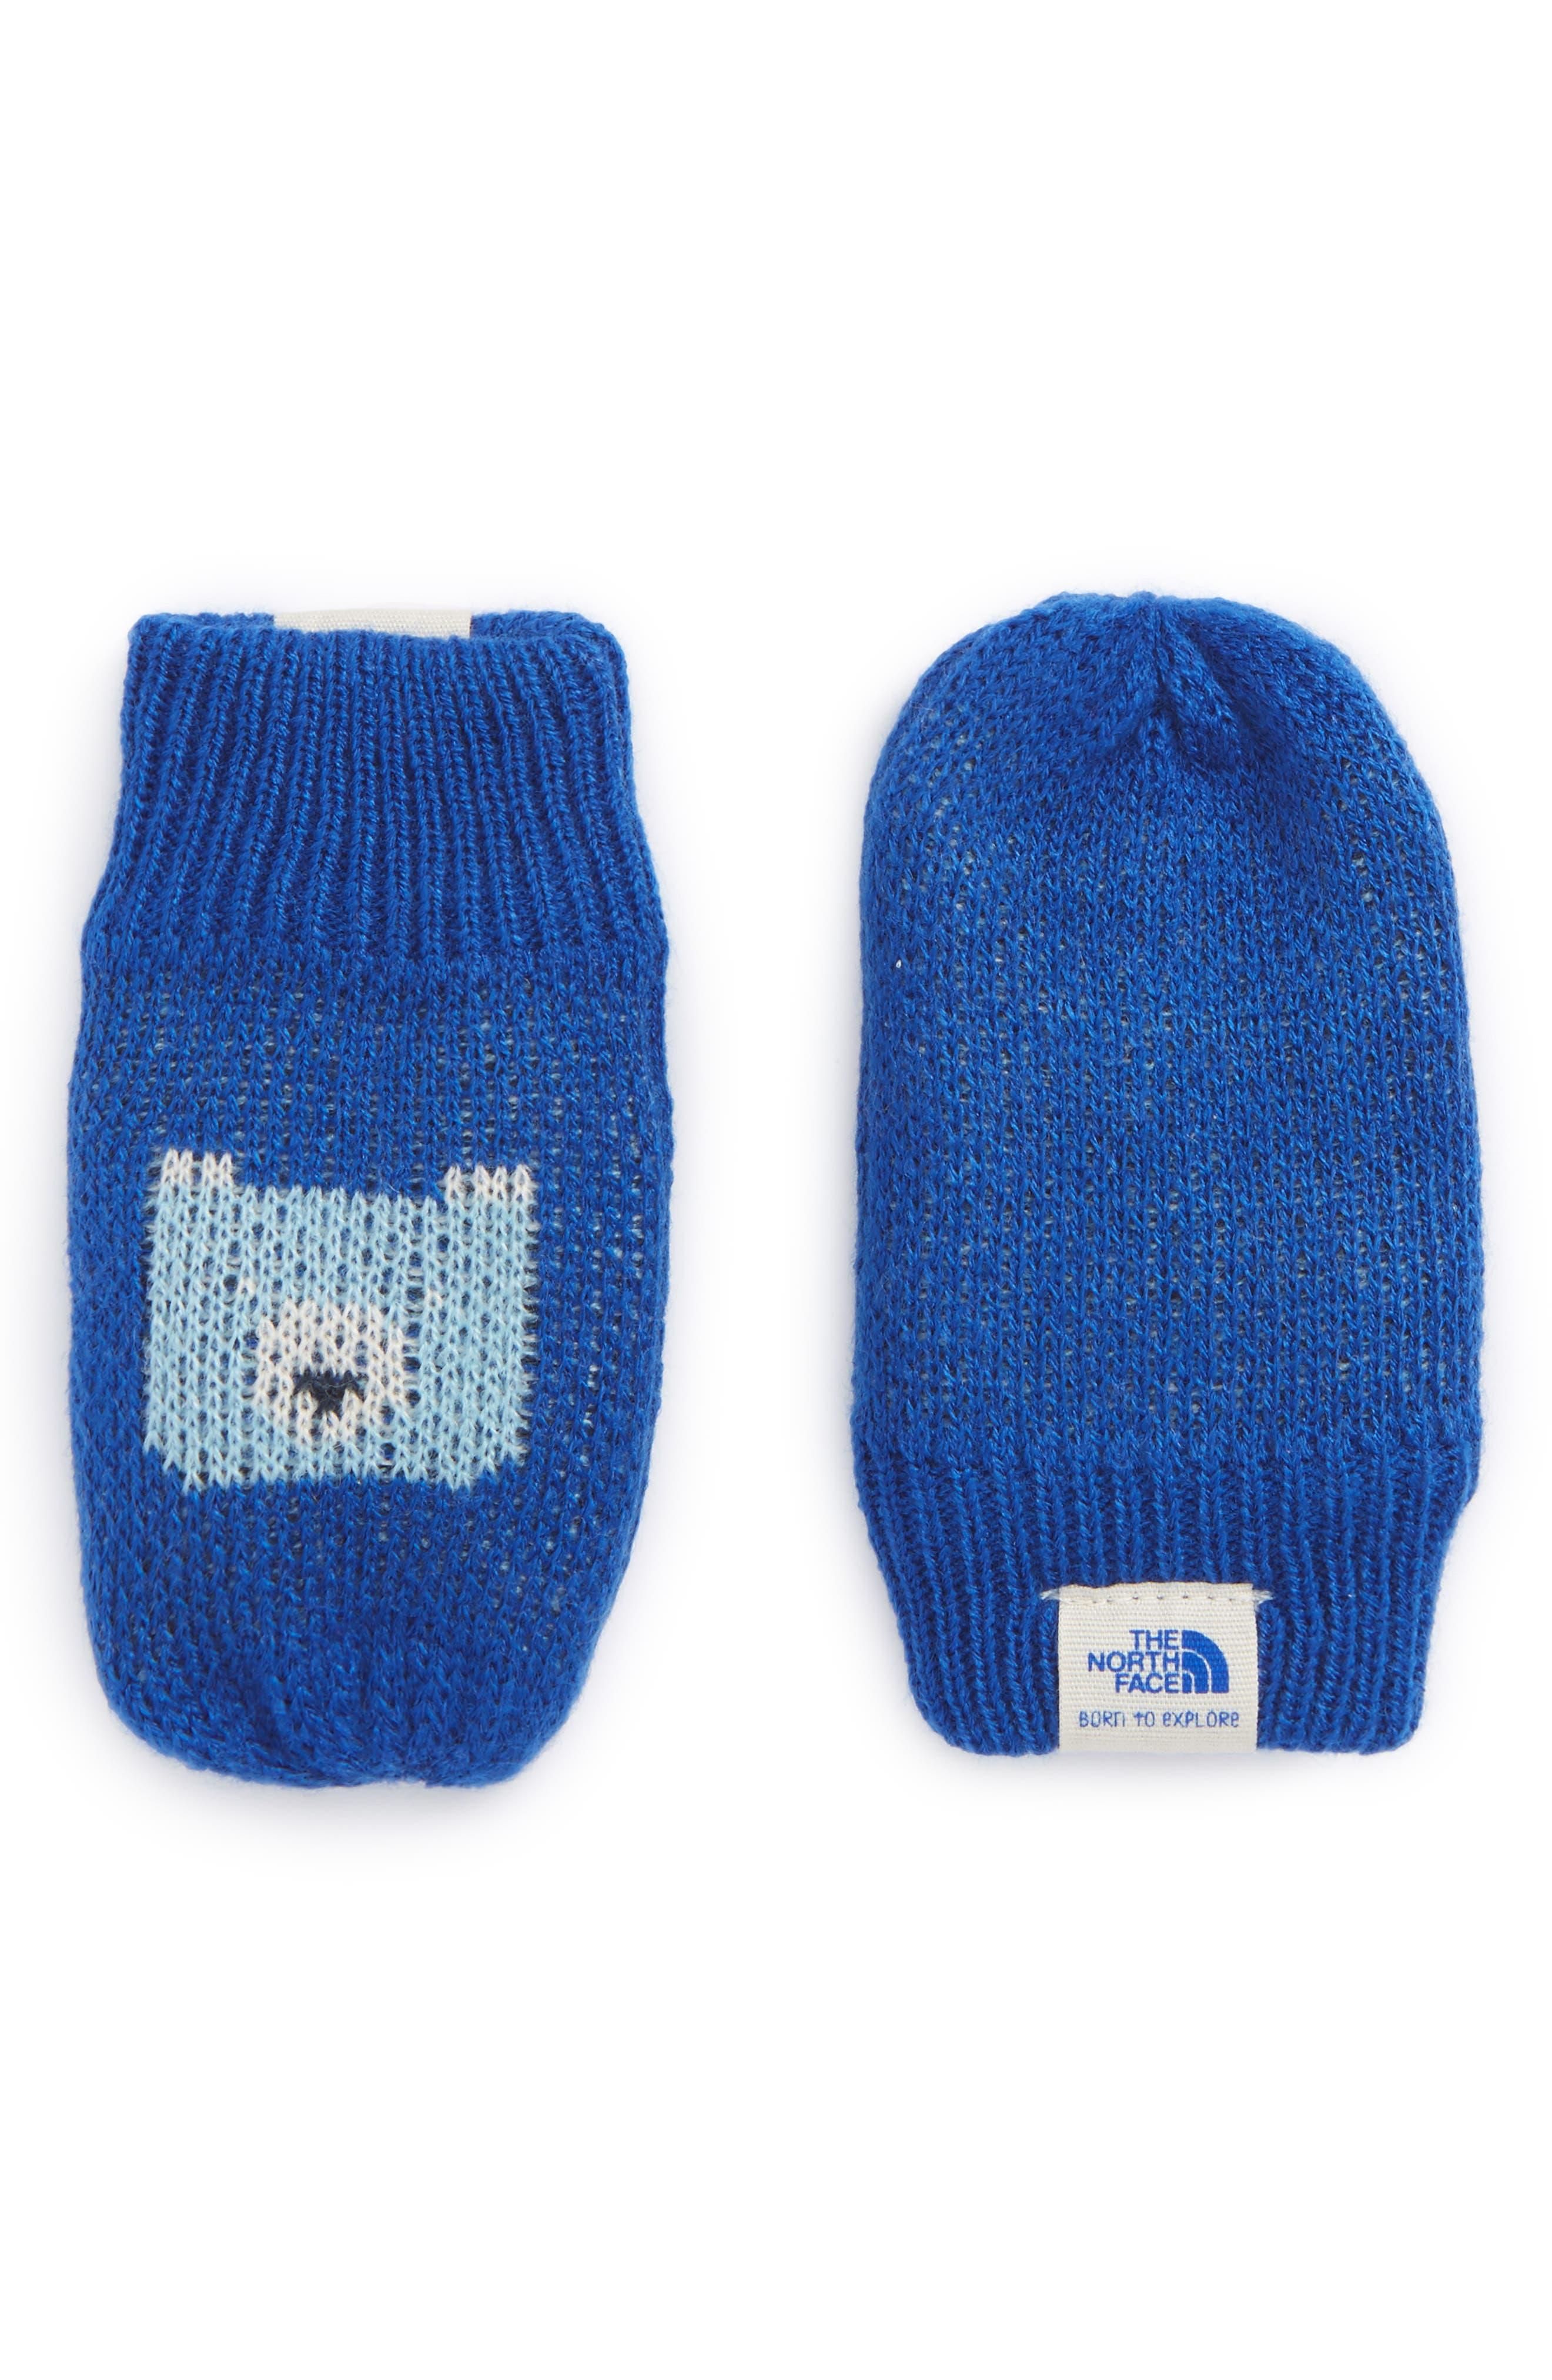 Faroe Knit Mittens,                         Main,                         color, Bright Cobalt